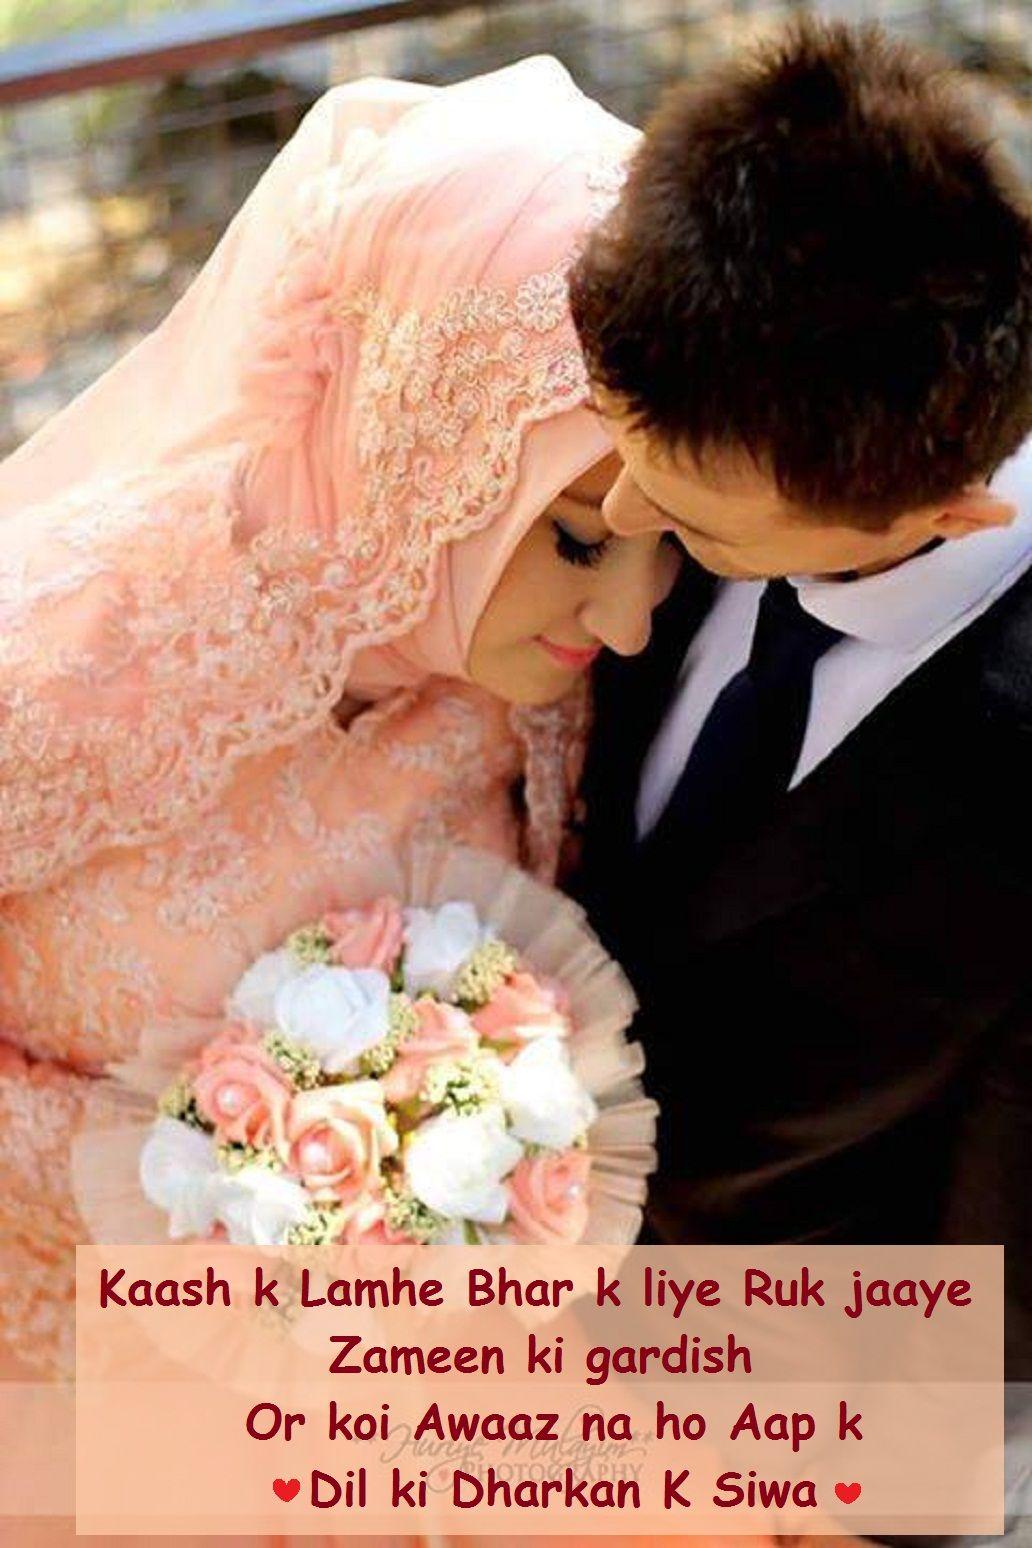 Husband Wife Love Quotes Images In Urdu: Pin By Princess Haseena On MERI SHAYARI